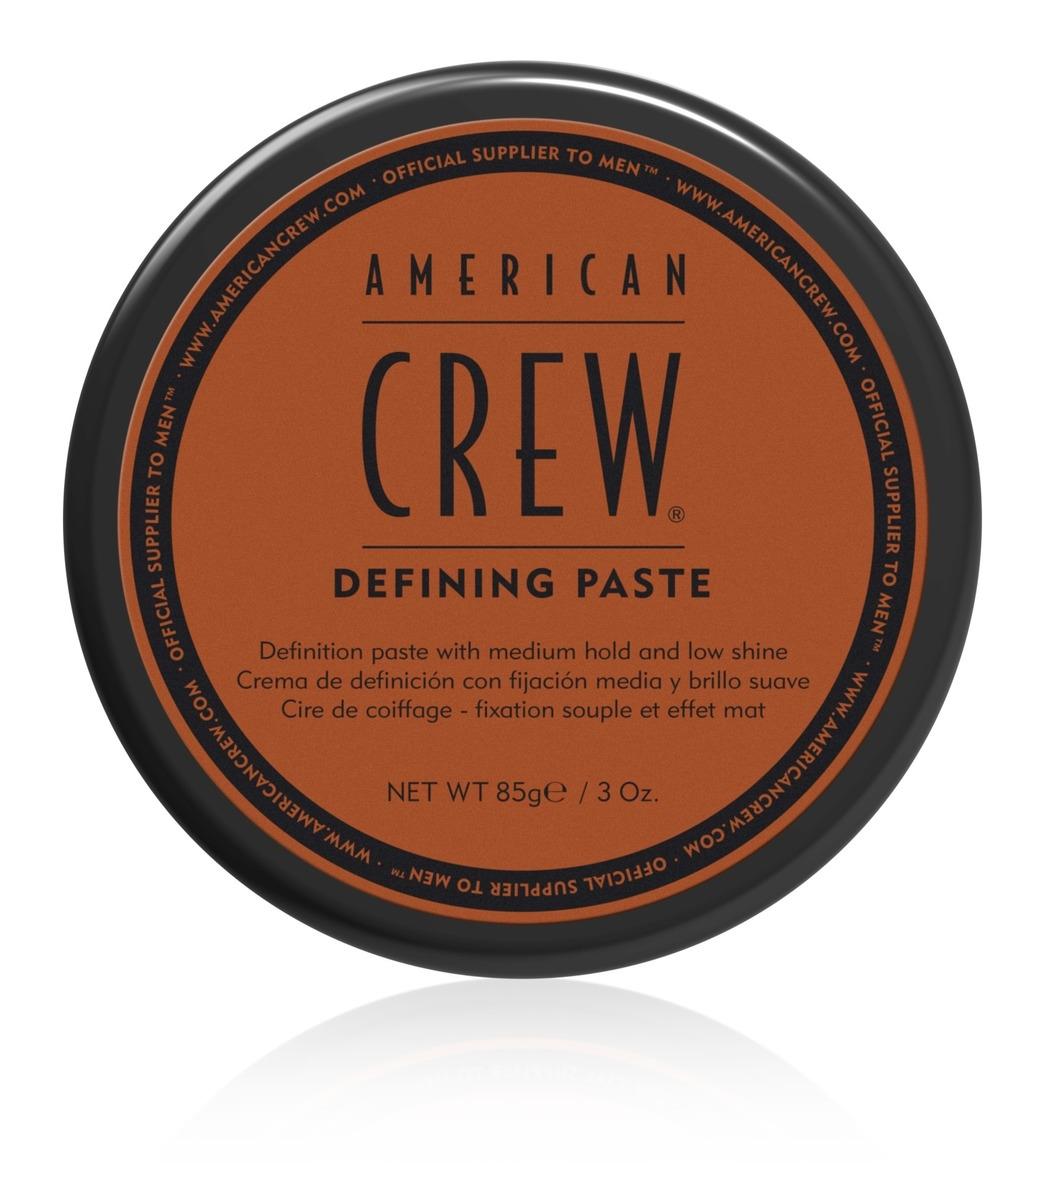 American Crew Defining Paste, 85 g